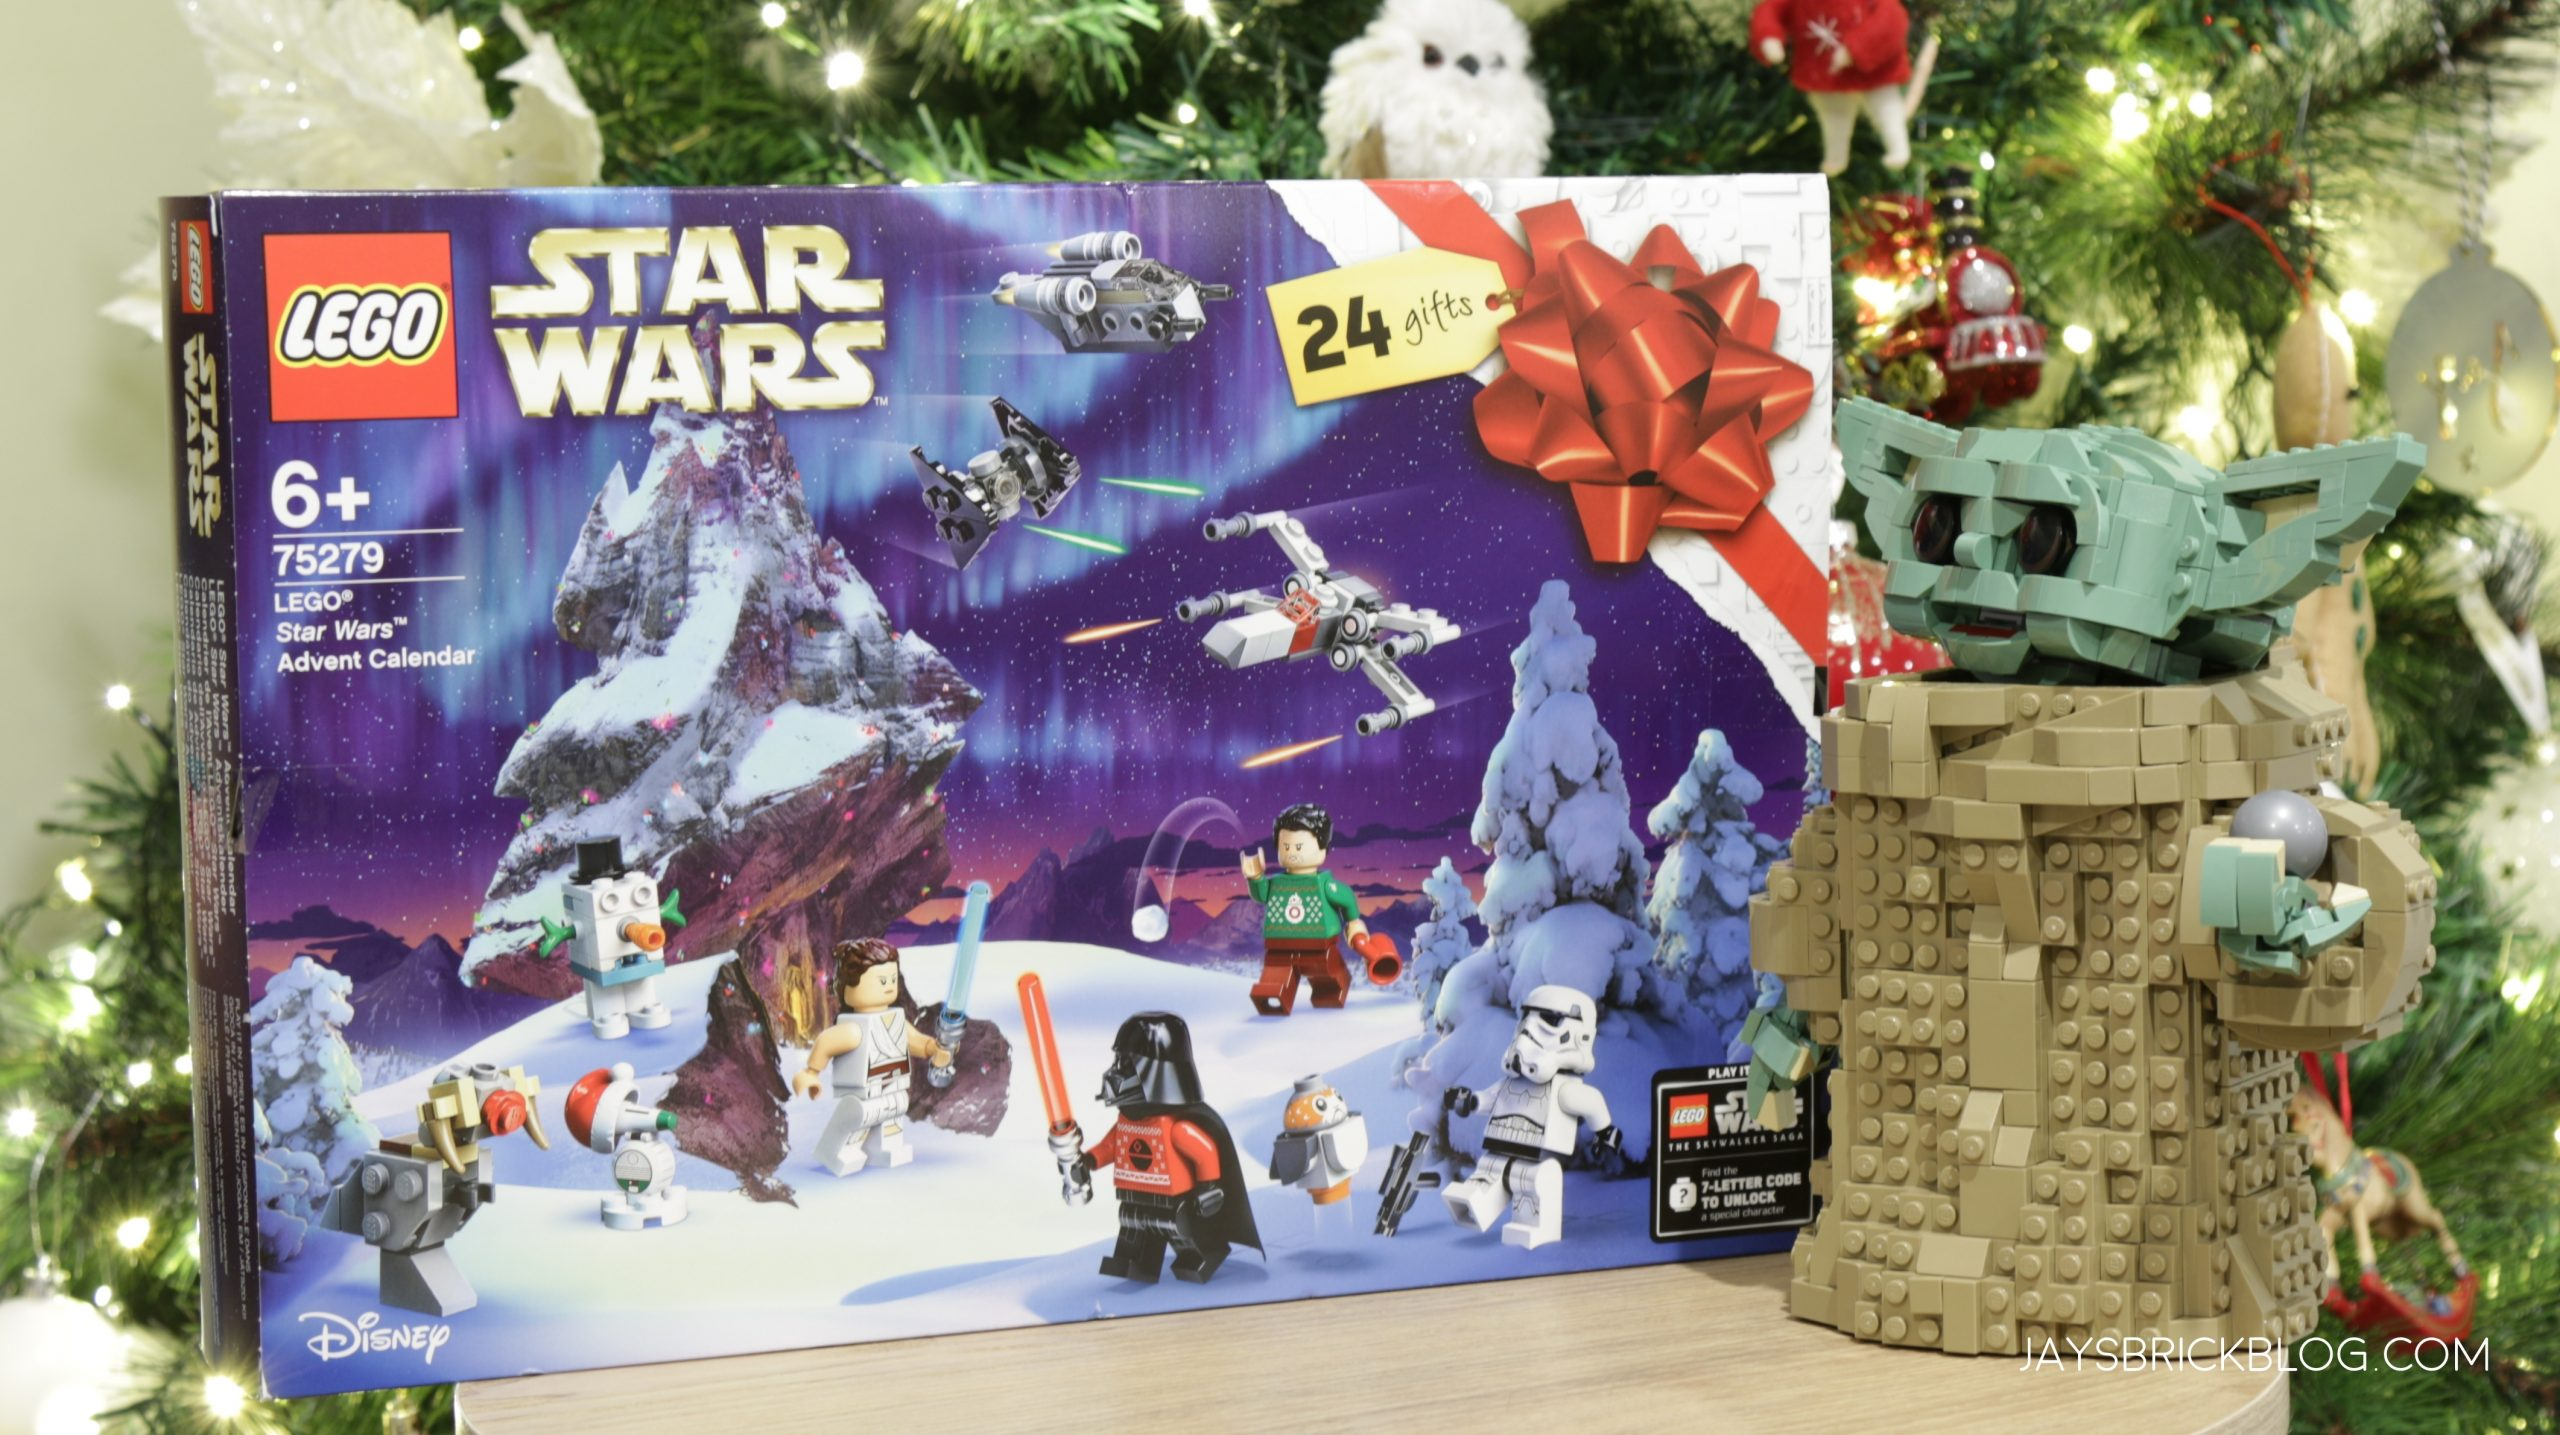 Lego Star Wars Advent Calendar 2020 - Daily Countdown